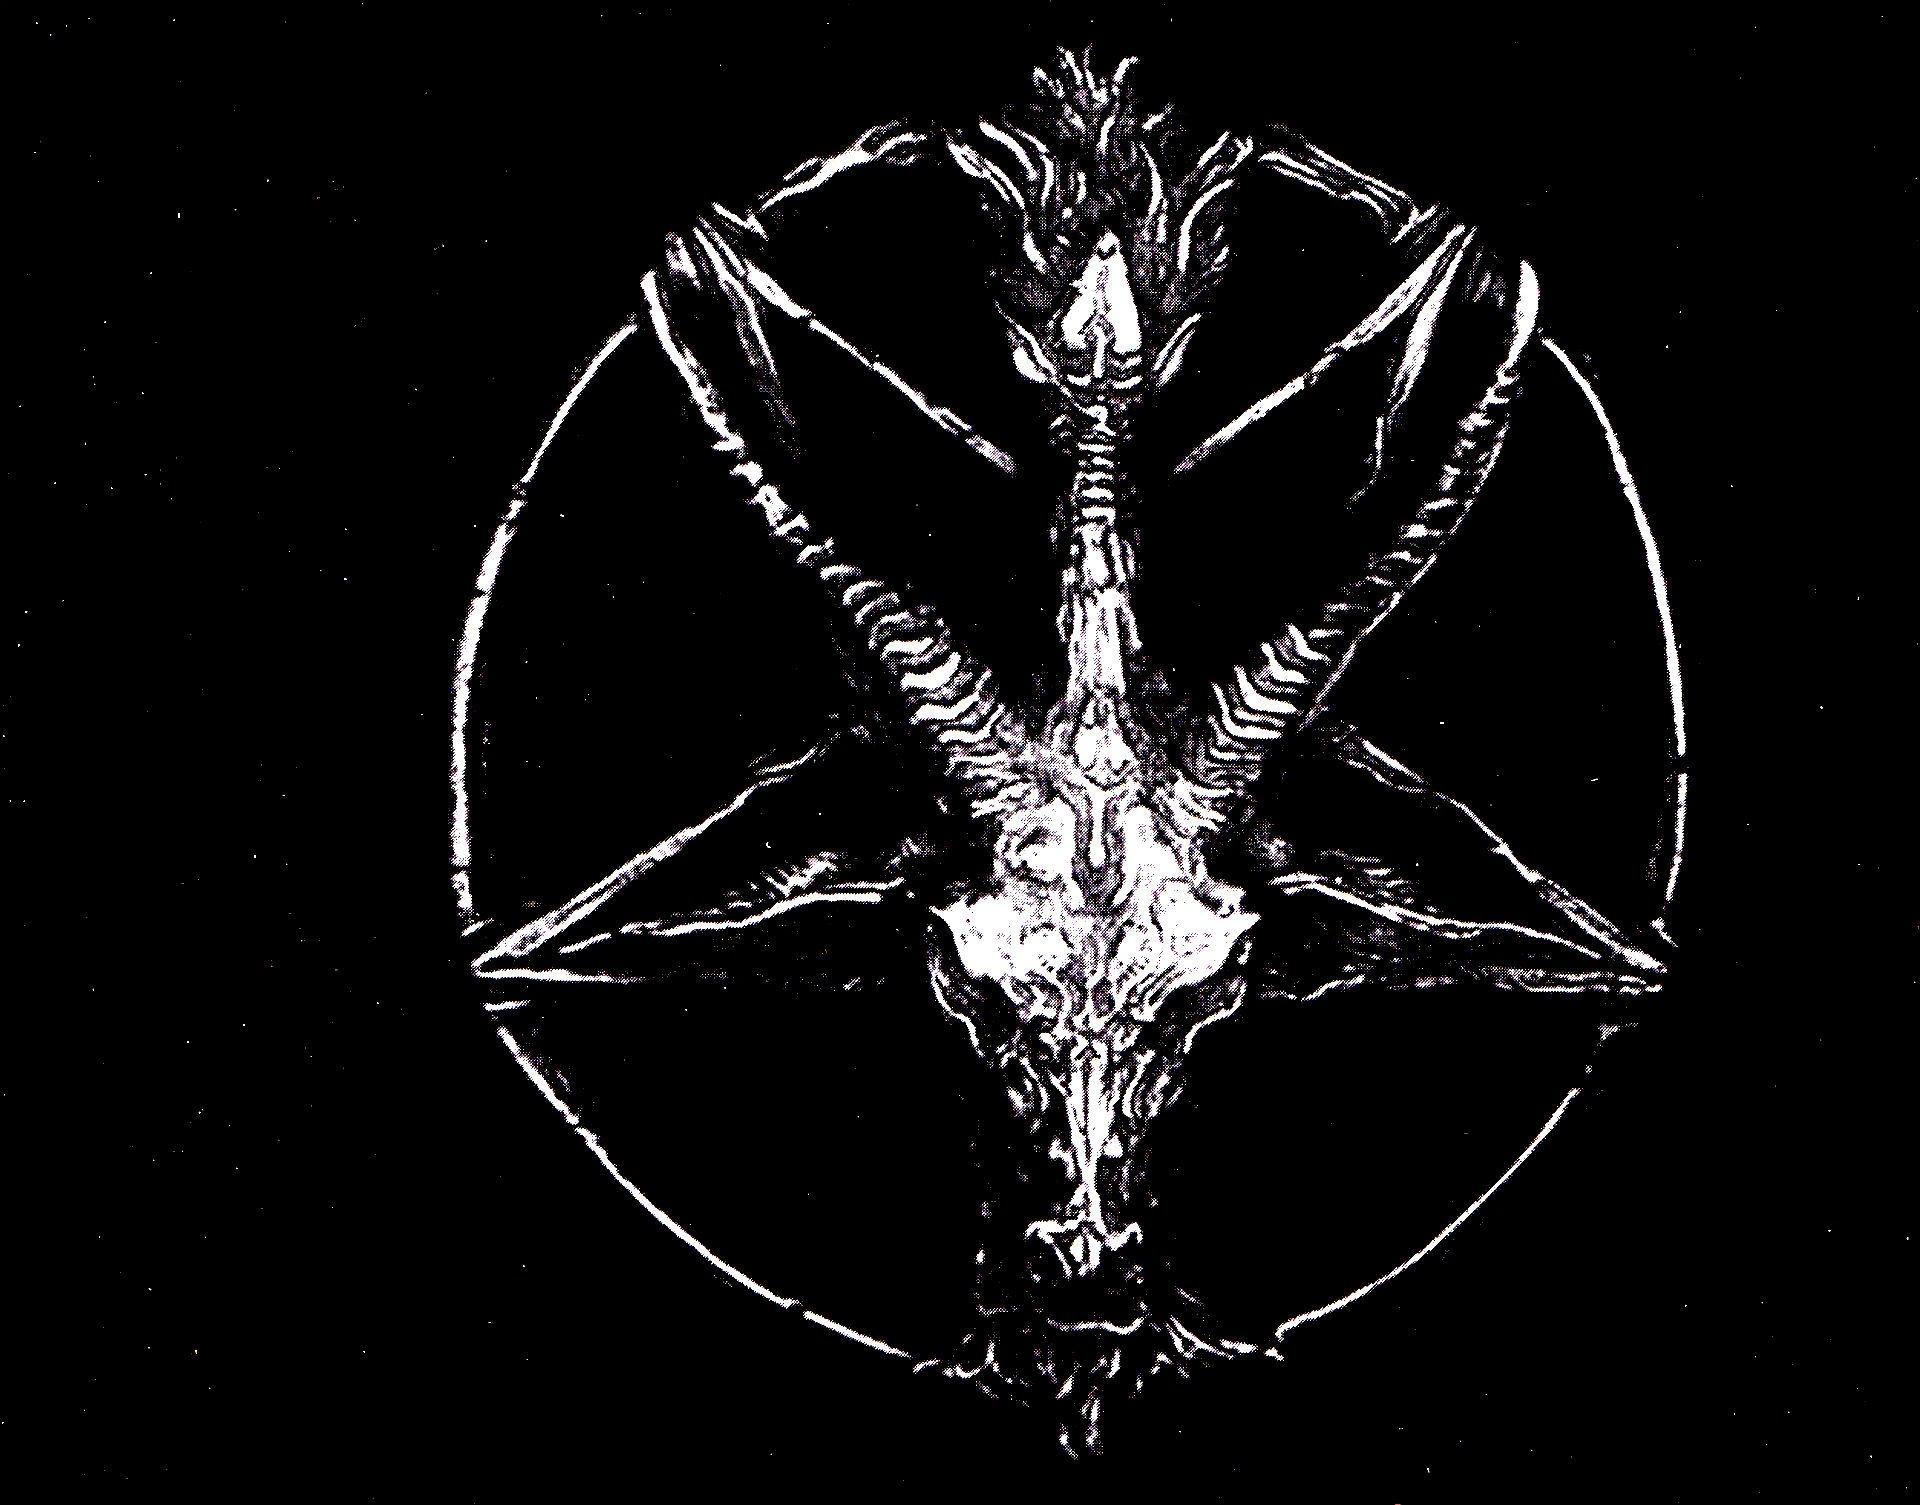 metal heavy satanic satan pentagram occult evil g wallpaper background 1920x1505